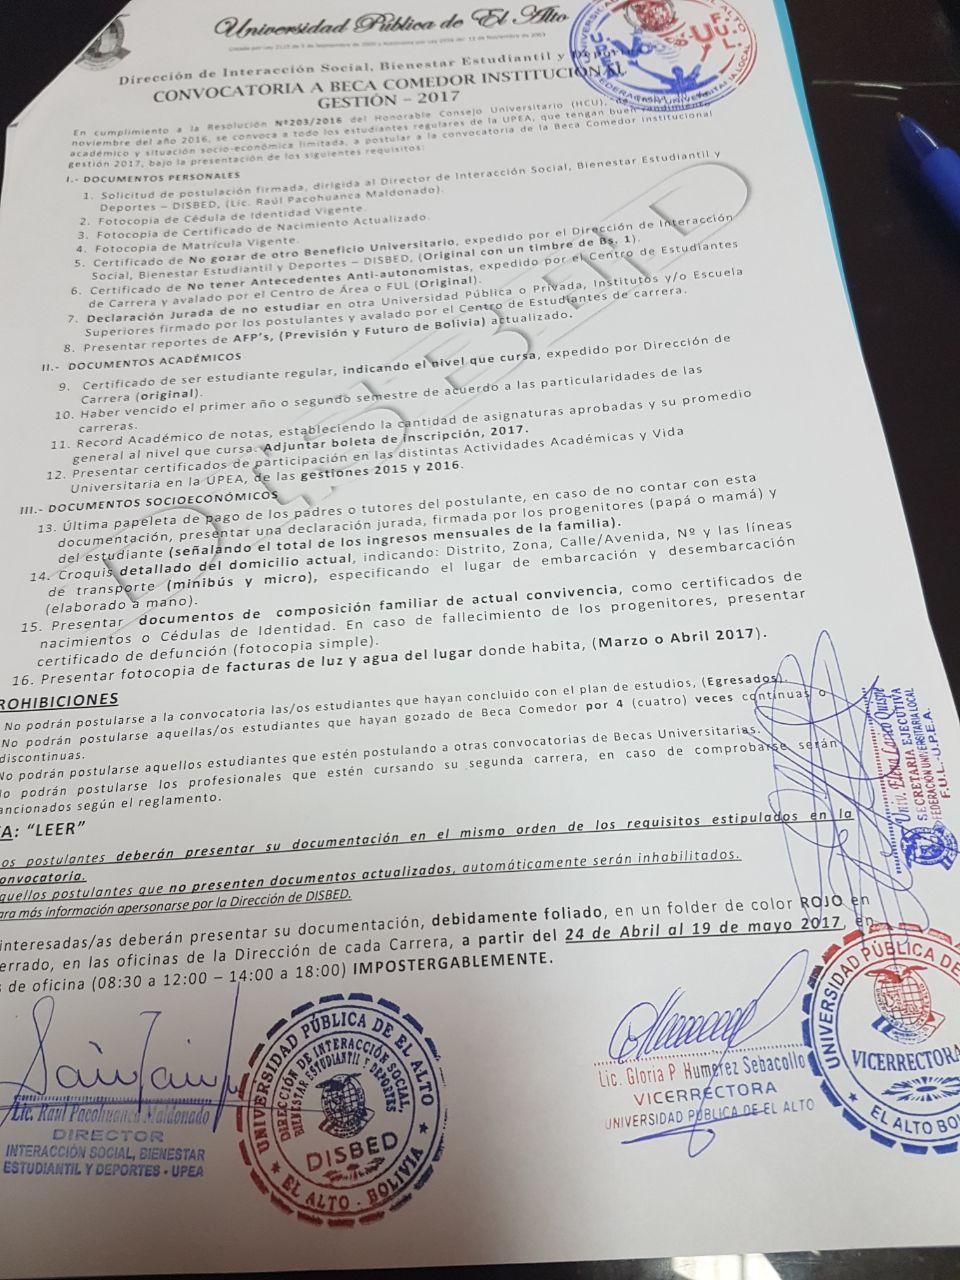 Requistos para la beca de comedor institucional de la UPEA ~ CARA a CARA